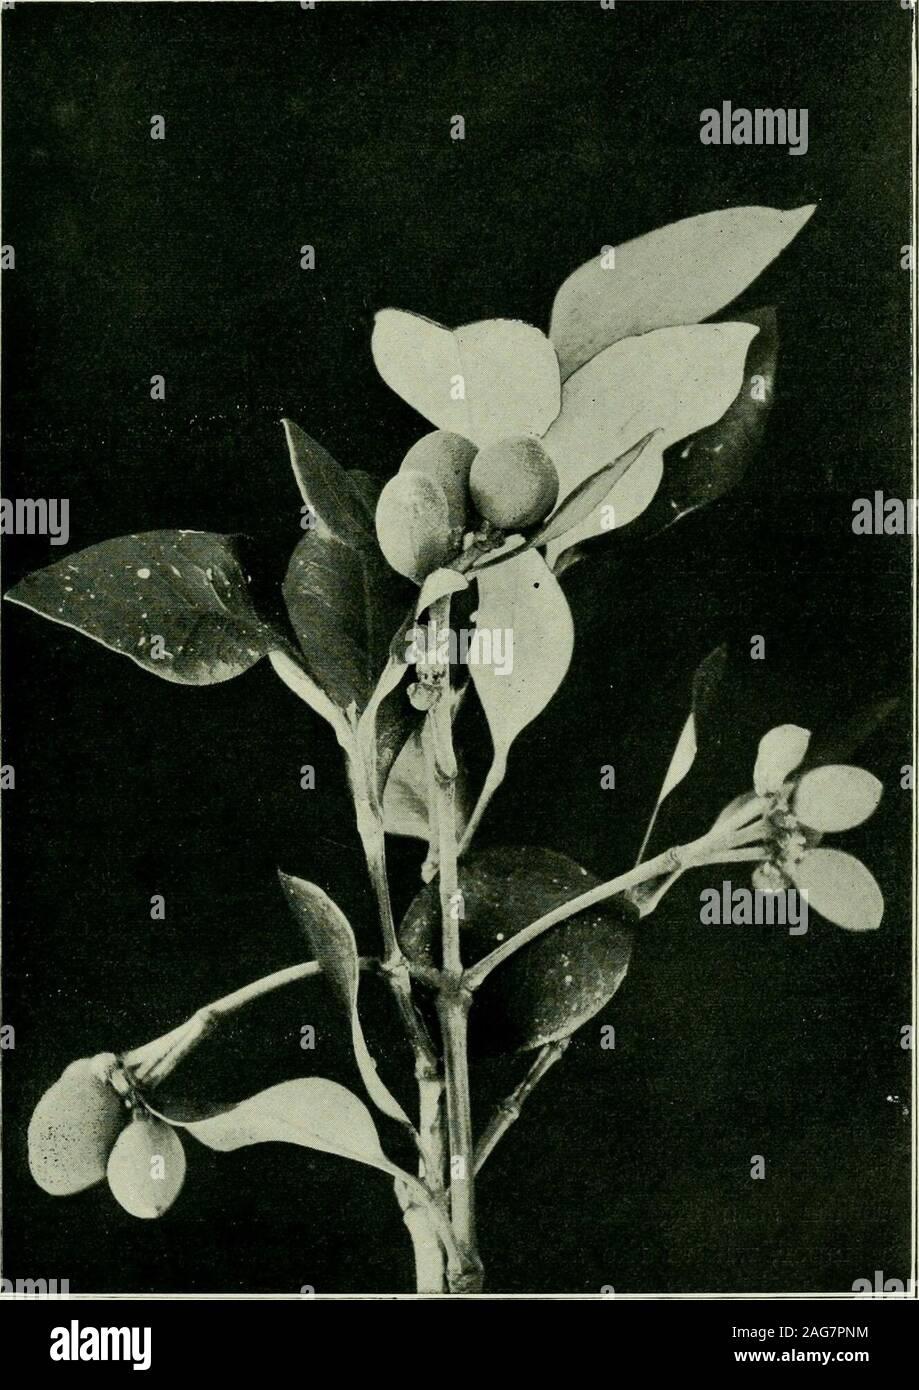 Garten Heftklammern U-förmig Pflanze Festsetzung Peg Anteil Gartenarbeit